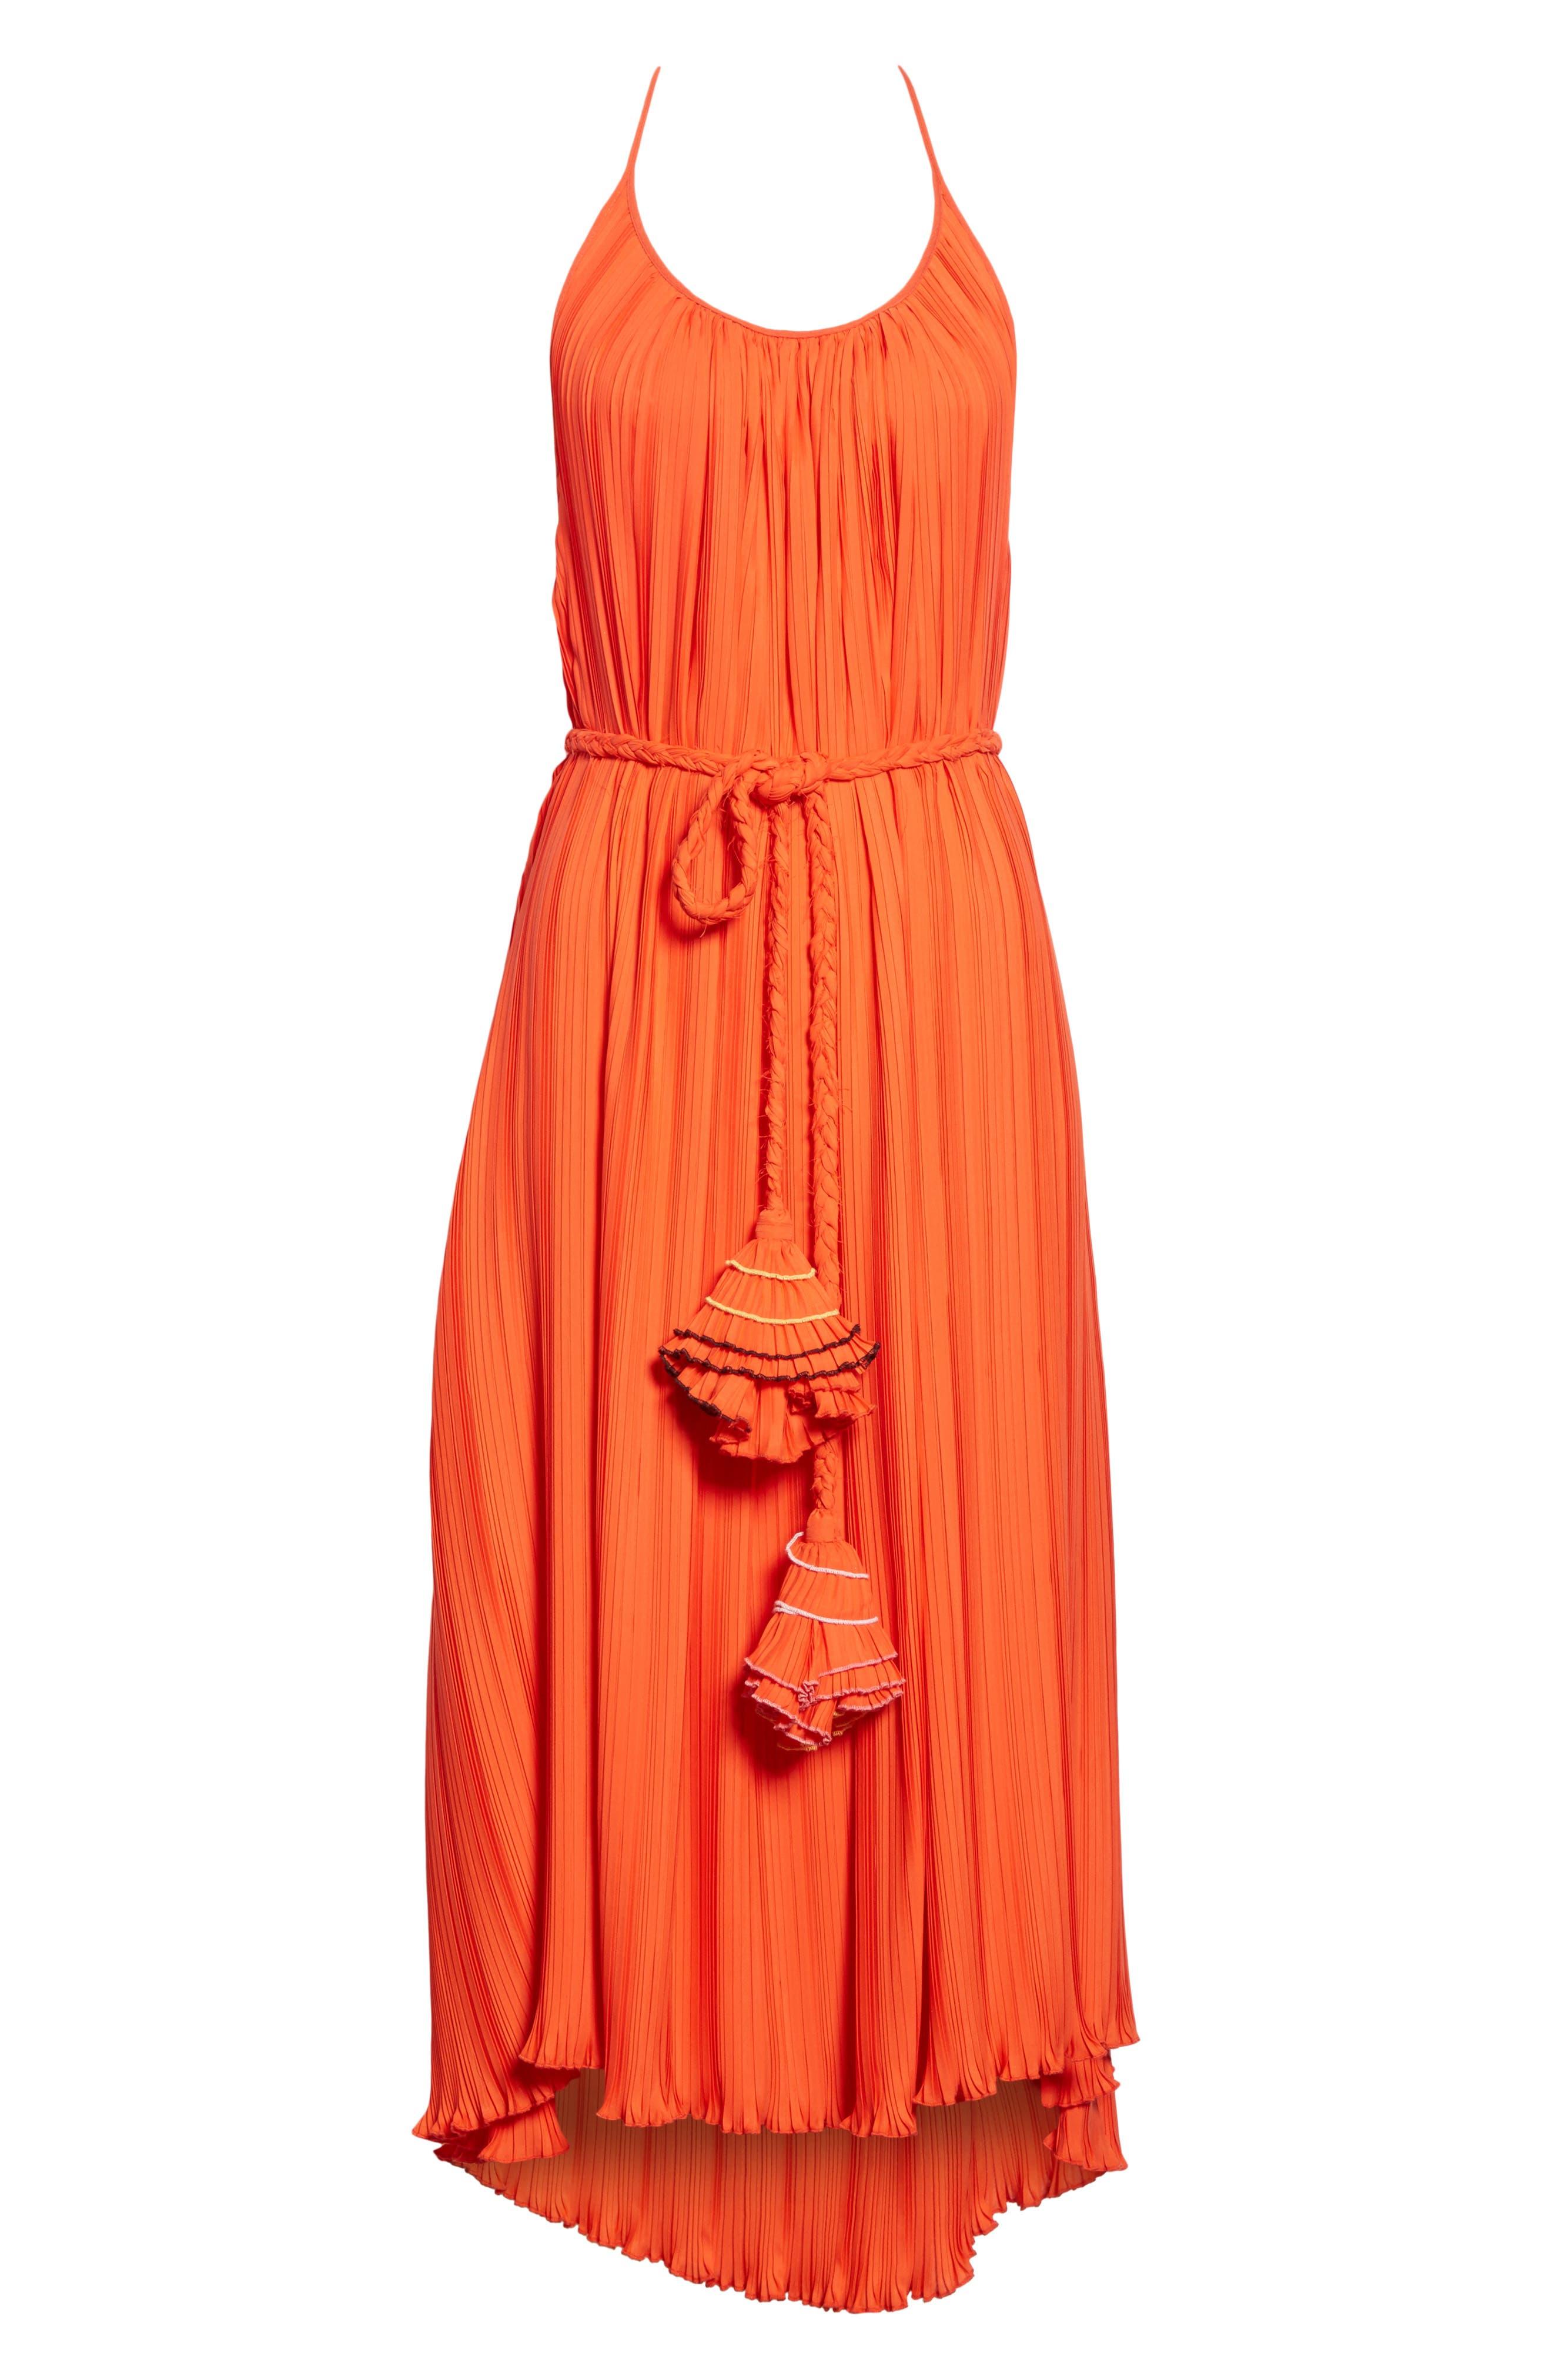 RACHEL COMEY,                             Sambuca Halter Dress,                             Alternate thumbnail 6, color,                             959